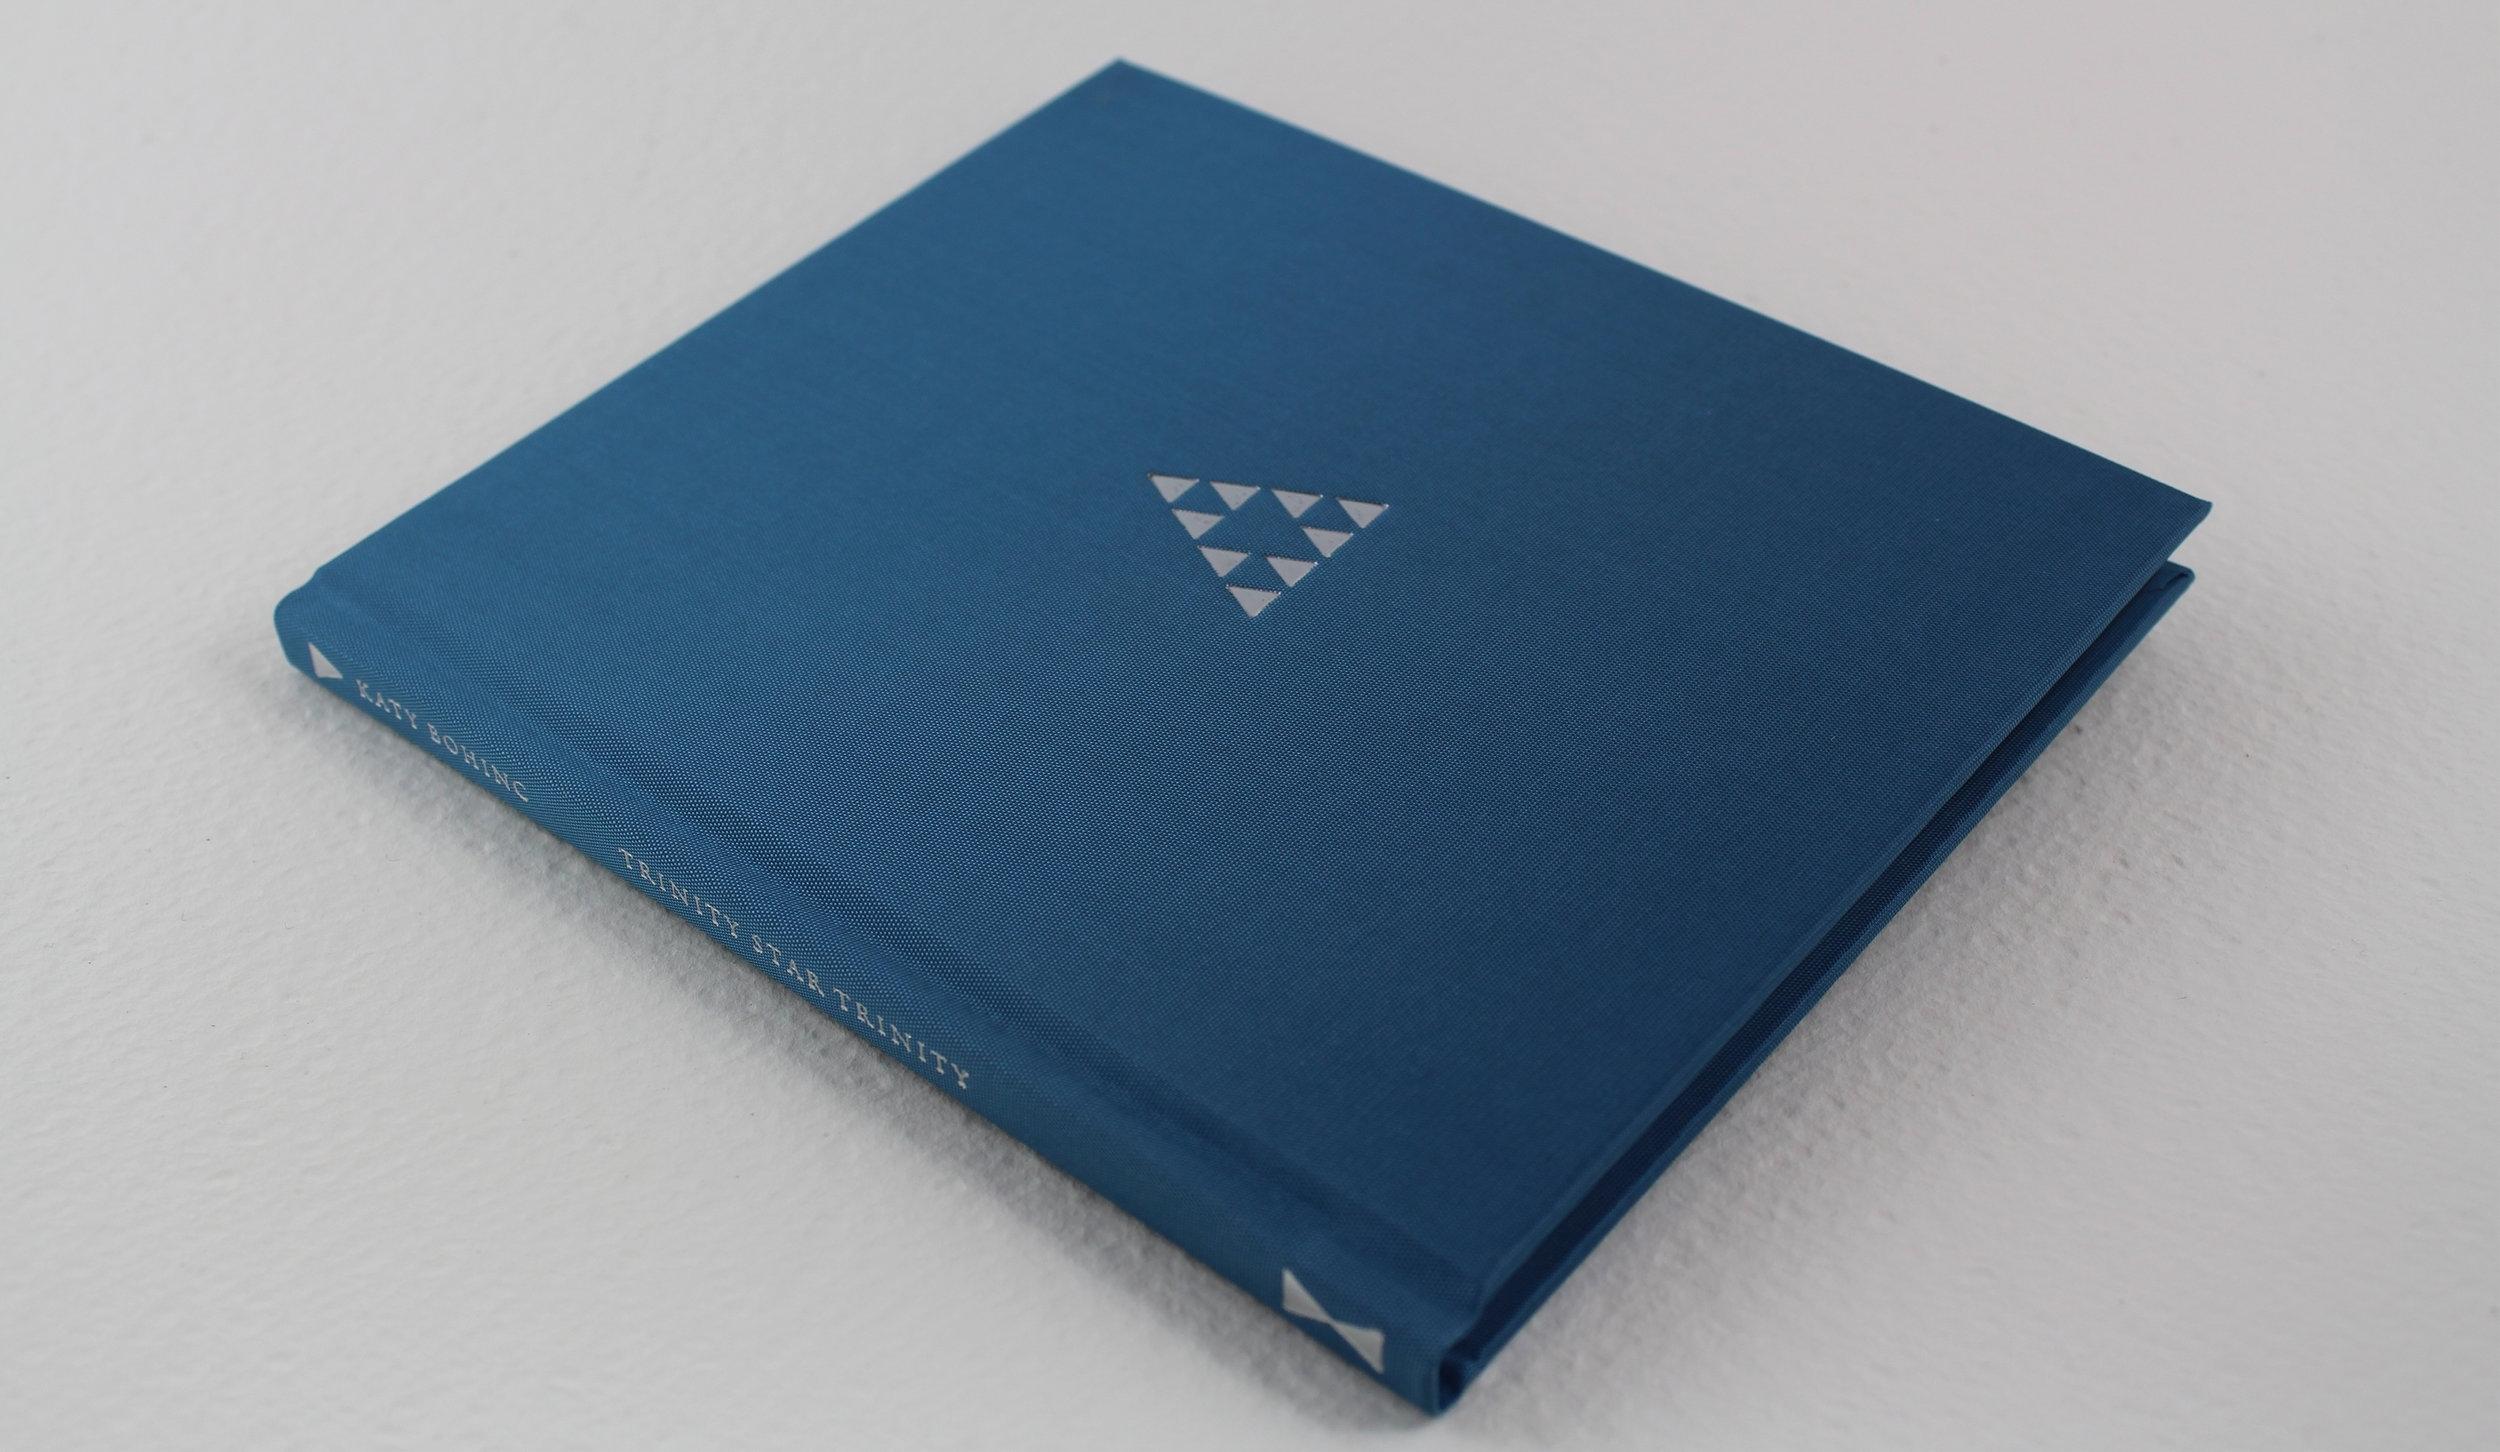 The standard edition bound in azure silk bookcloth